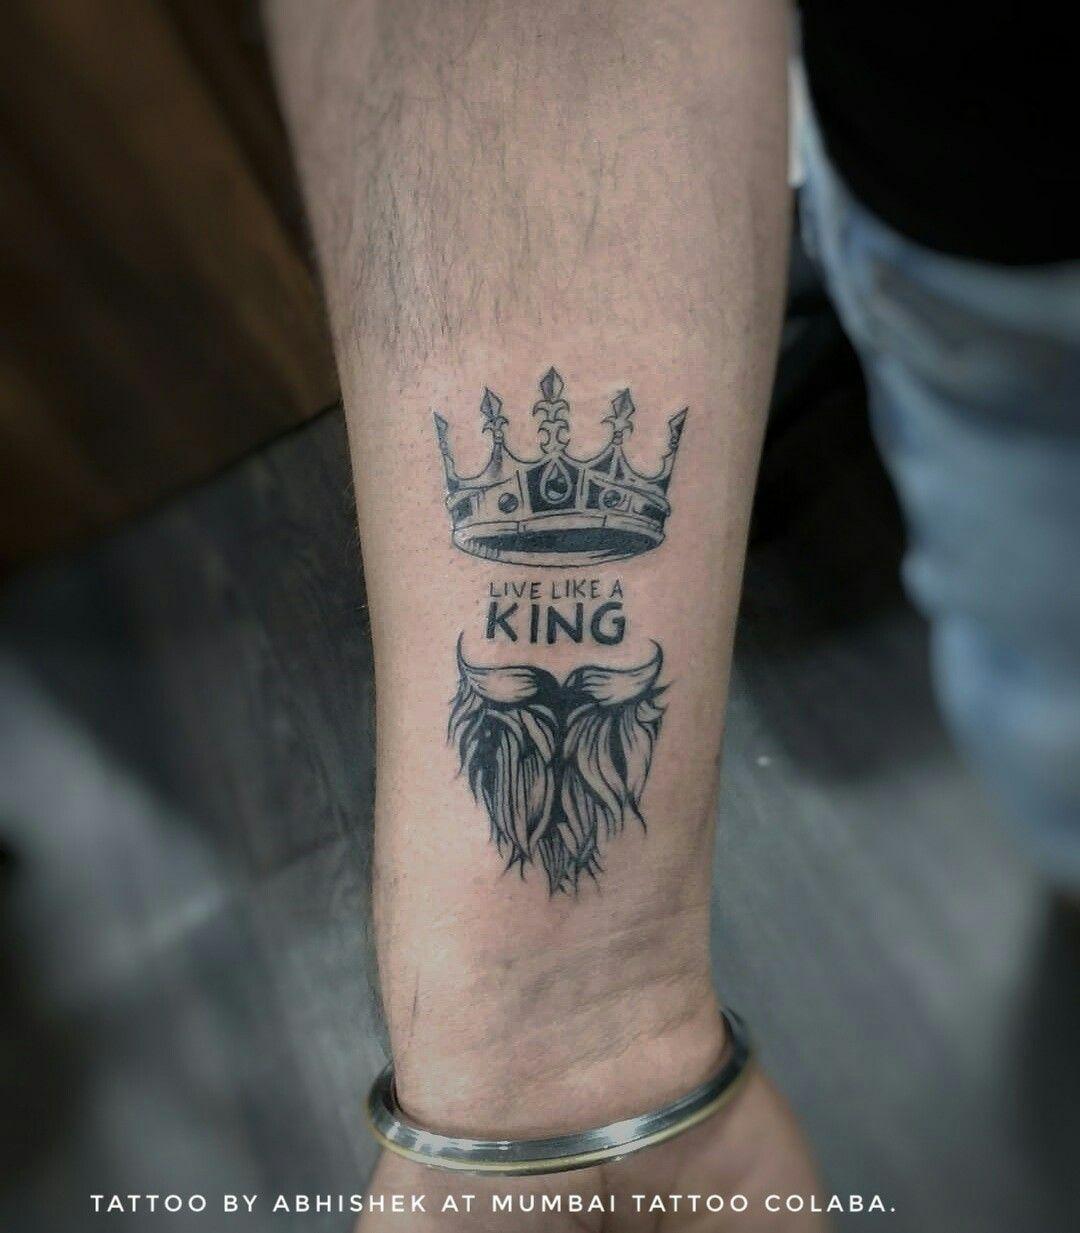 Live Like A King Crown With Beard Tattoo Tattoo By Abhishek Jaiswar Globaltattooindia Tattoo Ink Bea Neck Tattoo For Guys King Tattoos Neck Tattoo